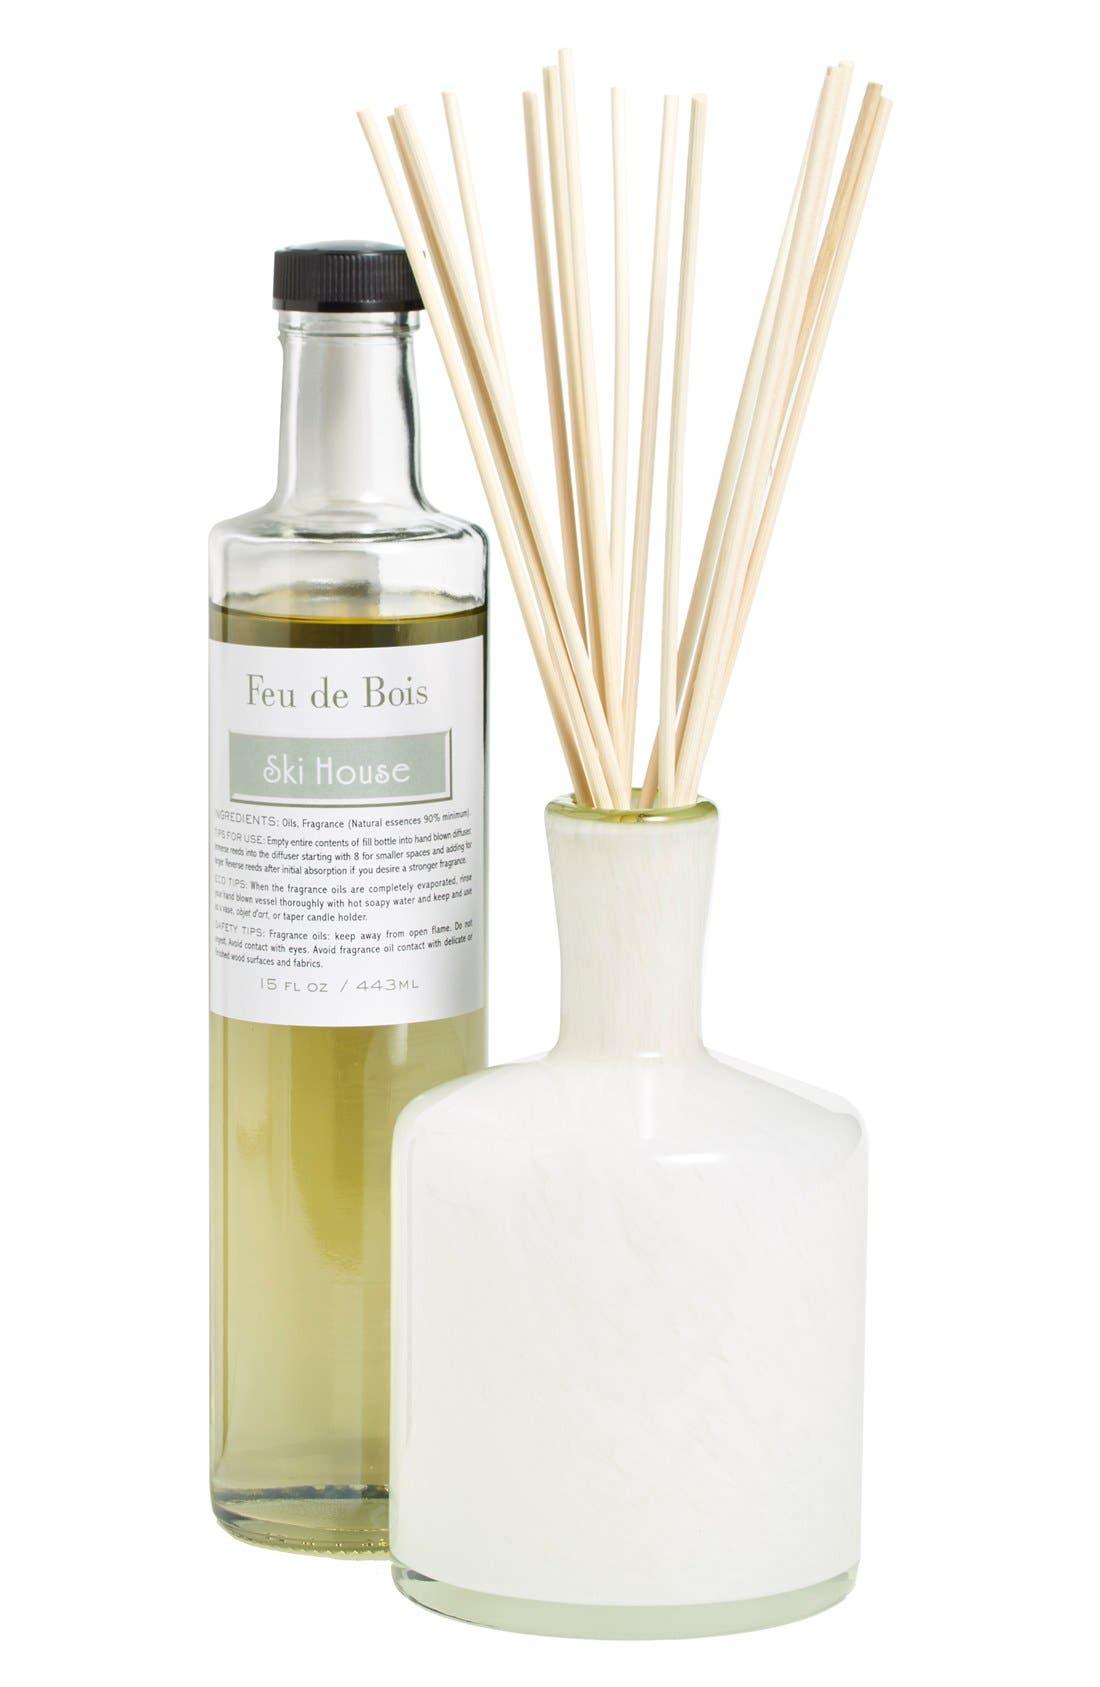 Lafco 'Feu de Bois - Ski House' Fragrance Diffuser